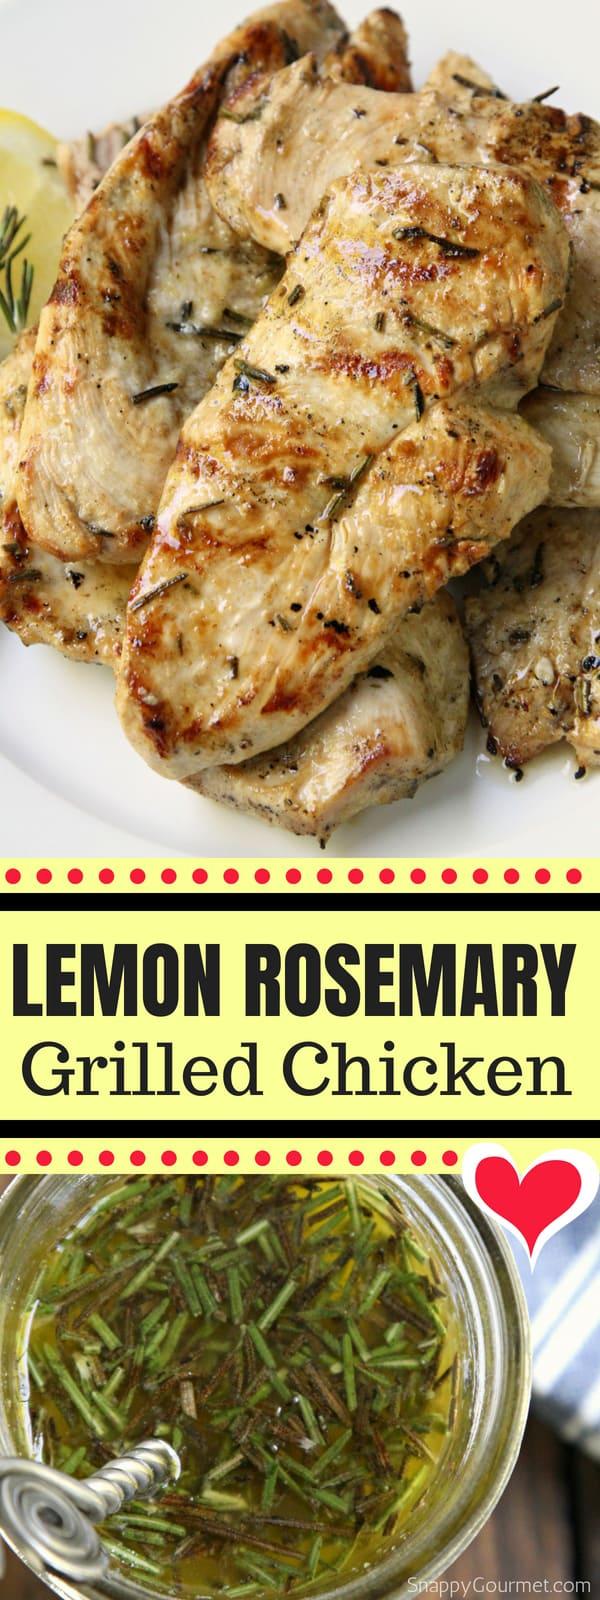 Lemon Rosemary Grilled Chicken, easy homemade chicken dinner with fresh lemon and rosemary. Plus, info on how long to grill chicken. #Chicken #Marinade #Dinner #SnappyGourmet #Recipe #Lemon #Rosemary #easy